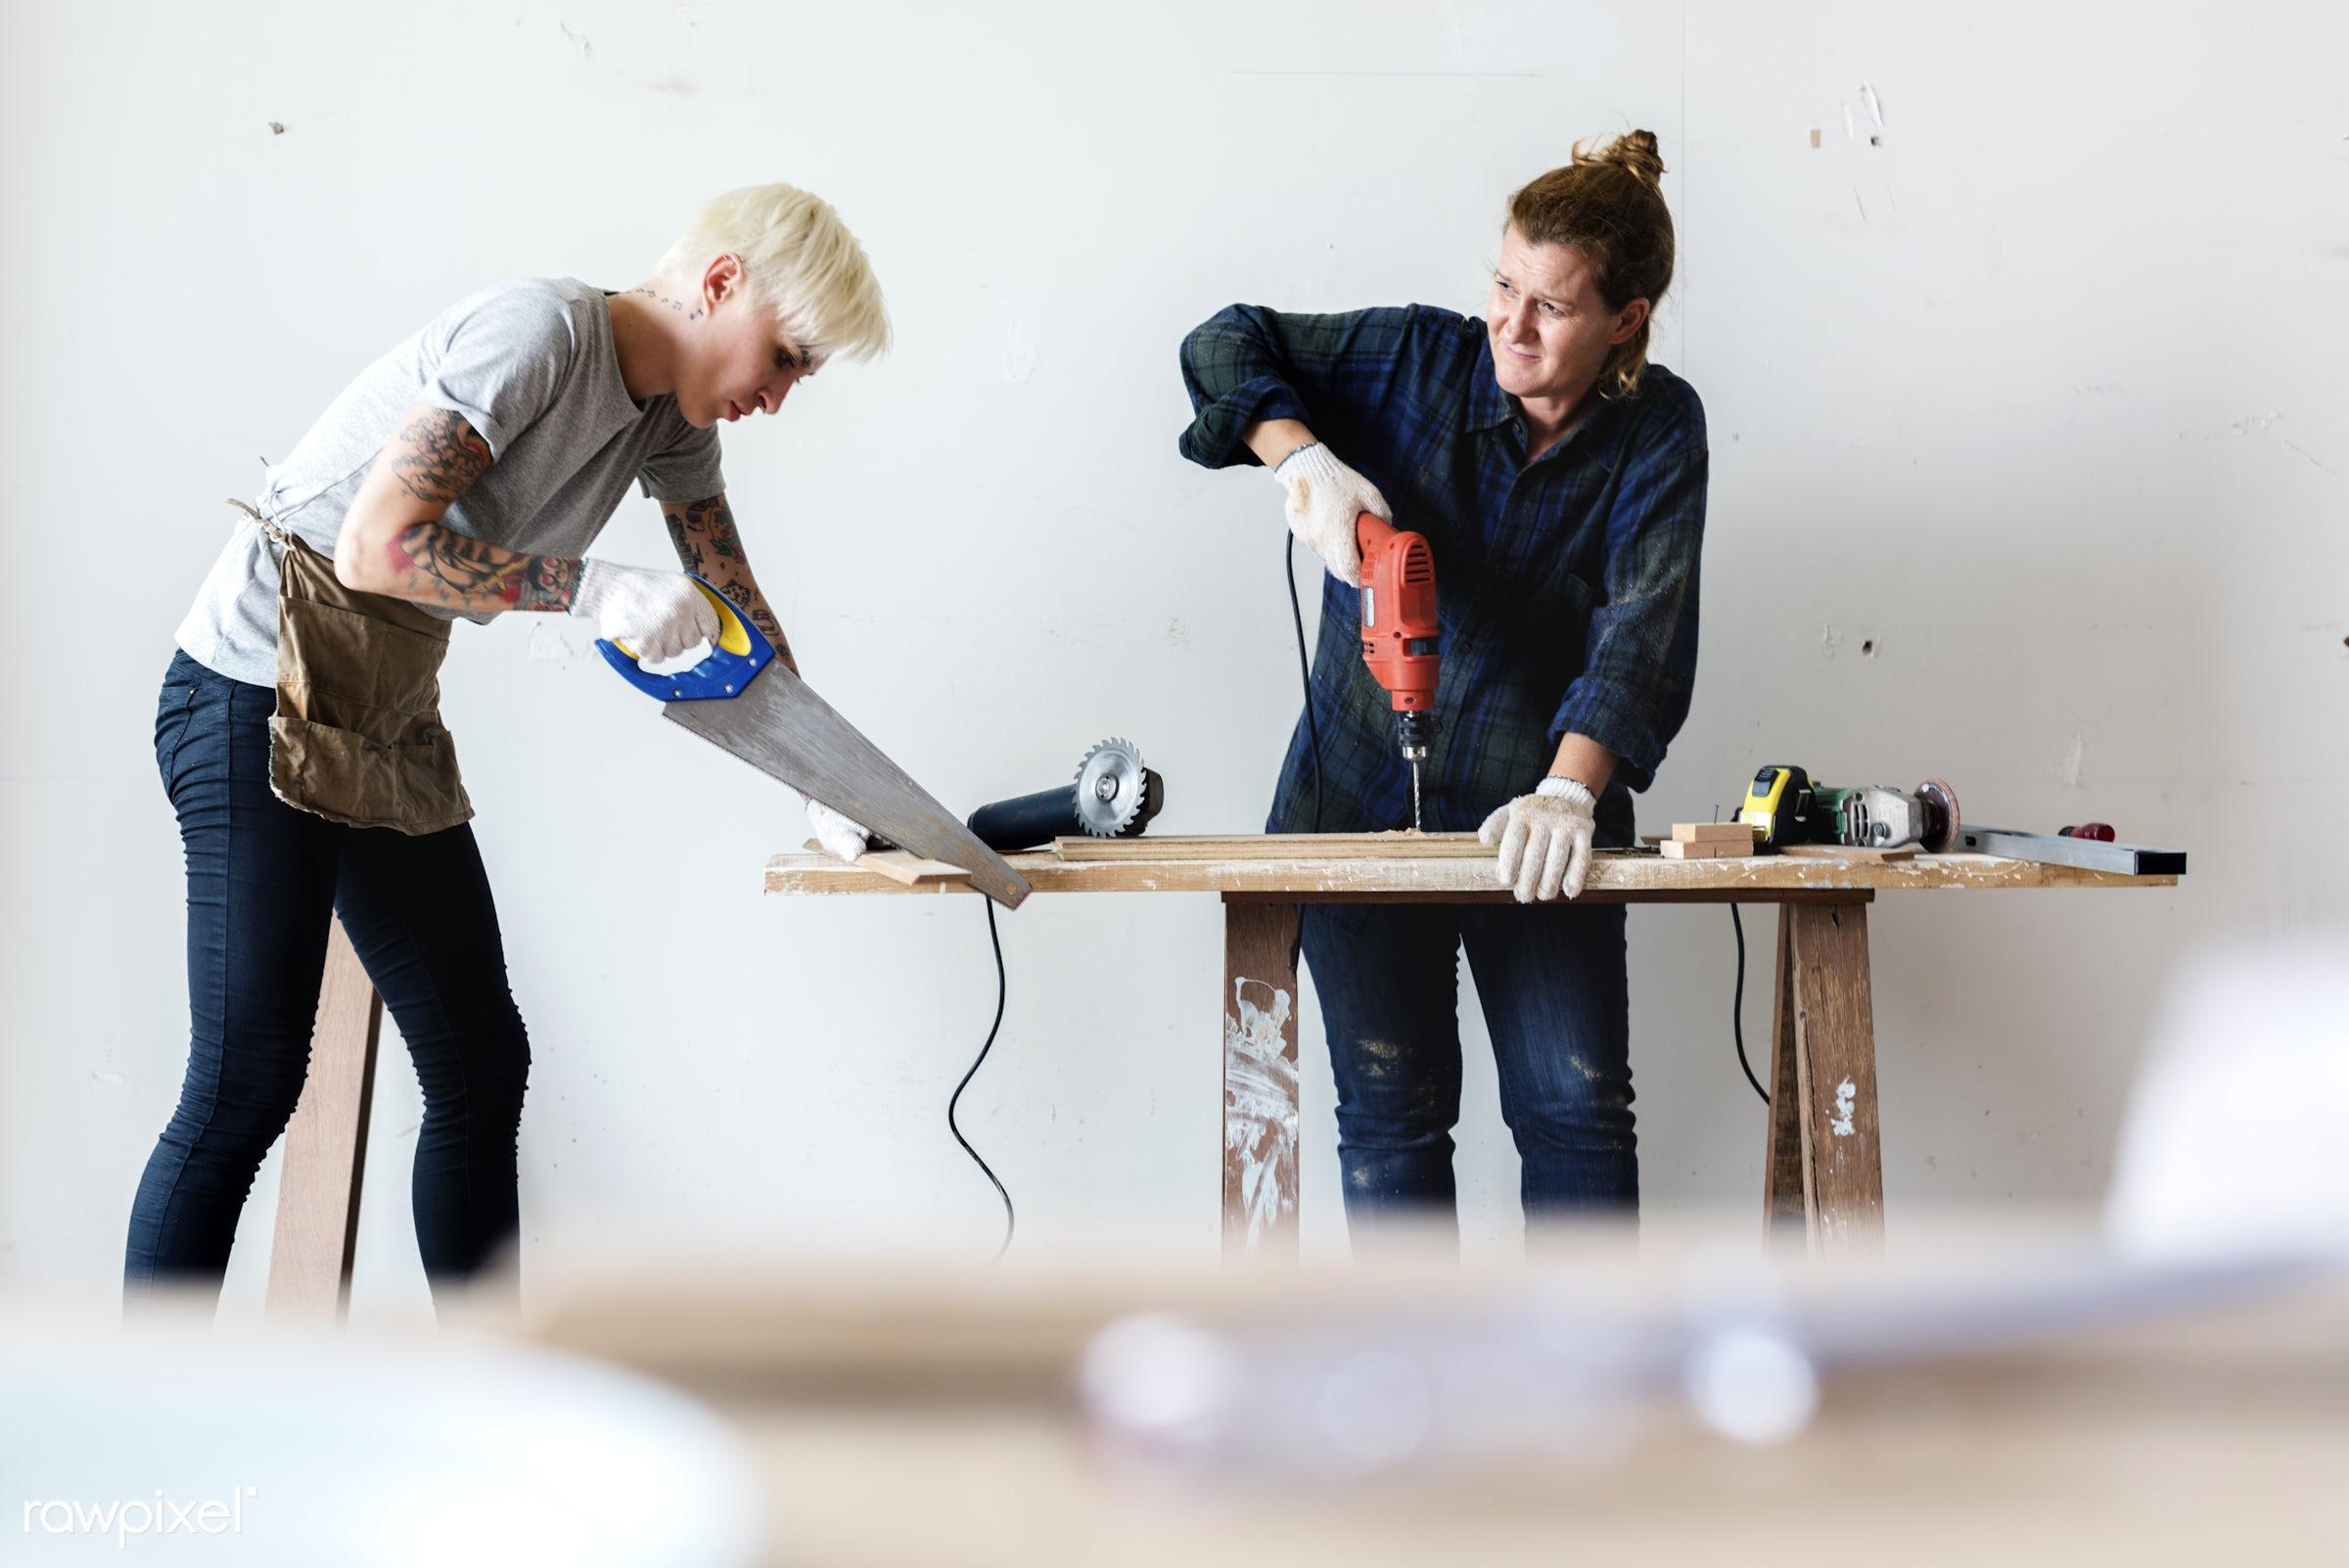 activity, american, auger, augers, british, carpenter, carpentry, construction, craft, craftsman, design, diy, drill,...